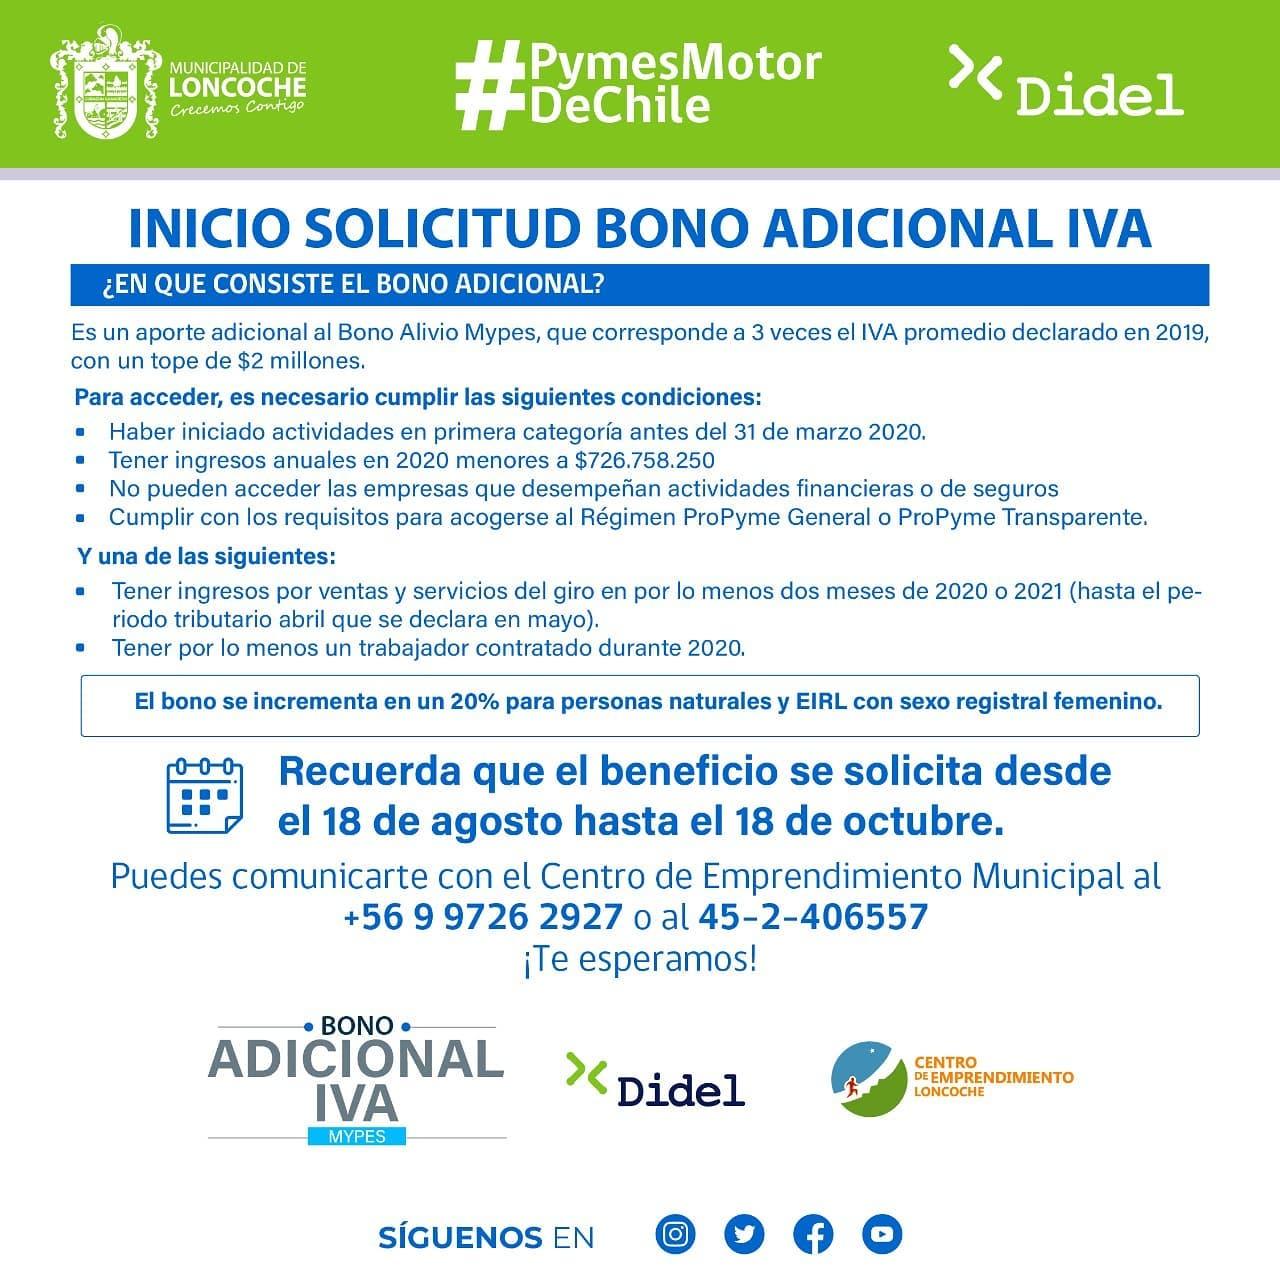 INICIO SOLICITUD BONO ADICIONAL IVA.